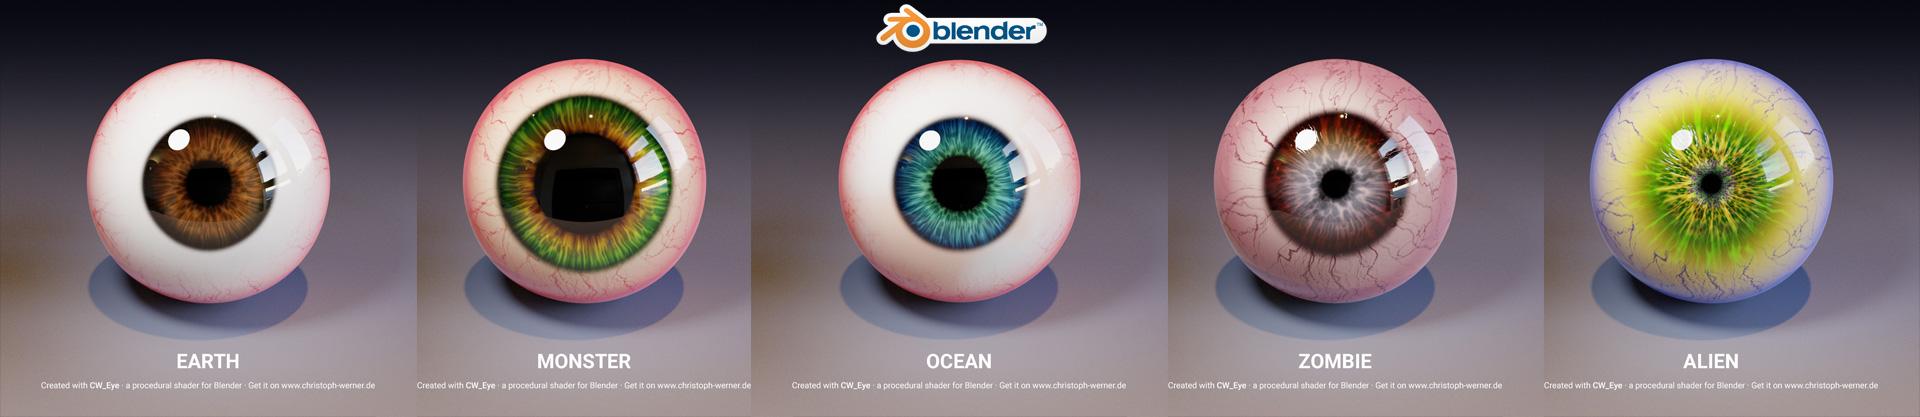 CW Eye – Procedural Eye Material for Blender